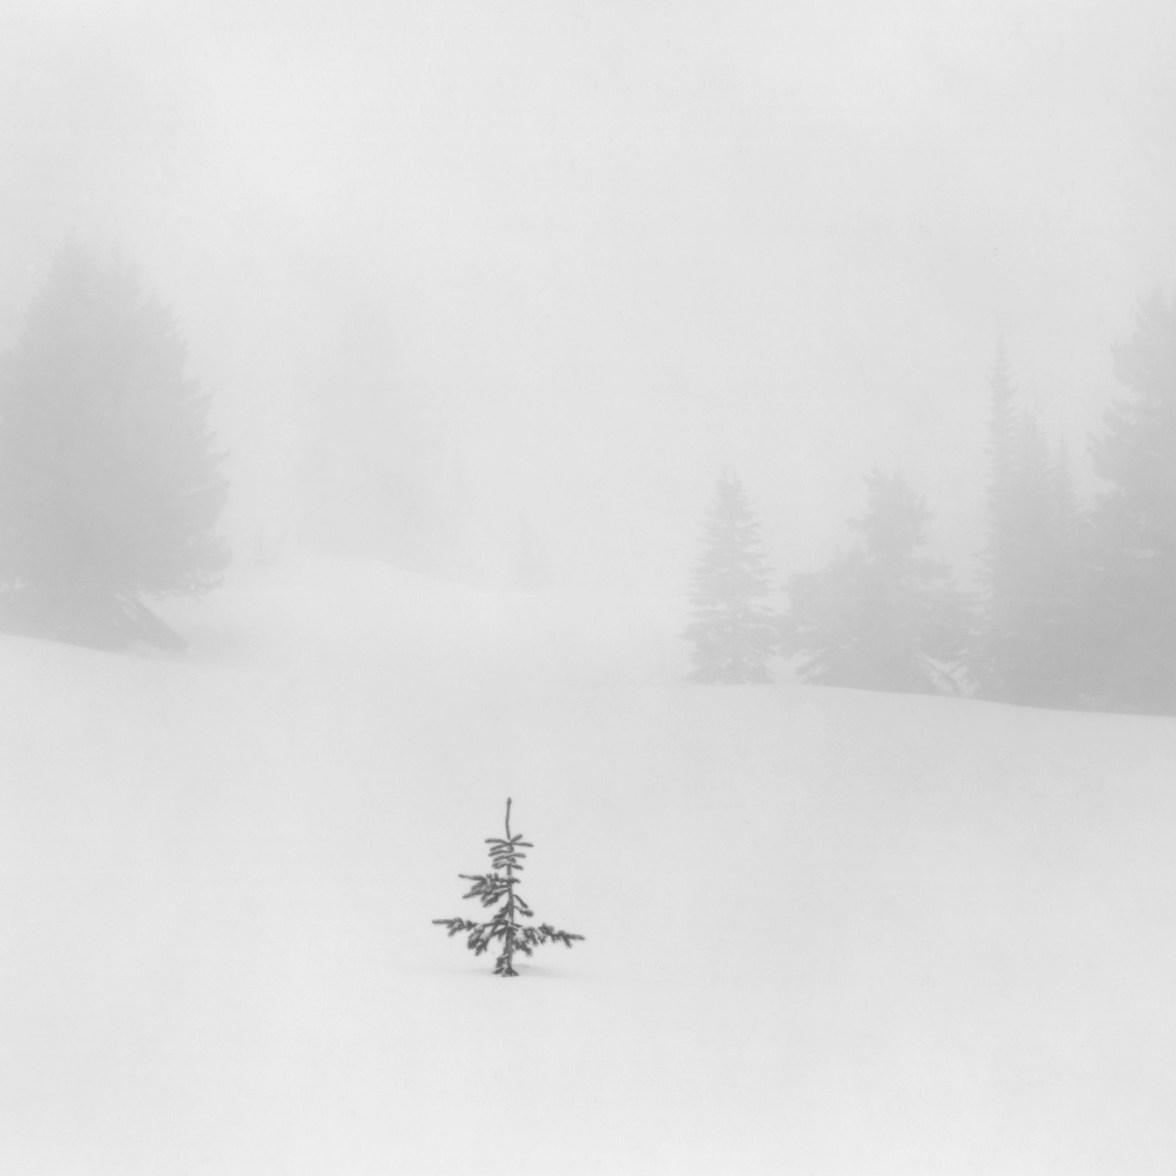 Sapling in Snow © Alan Ross